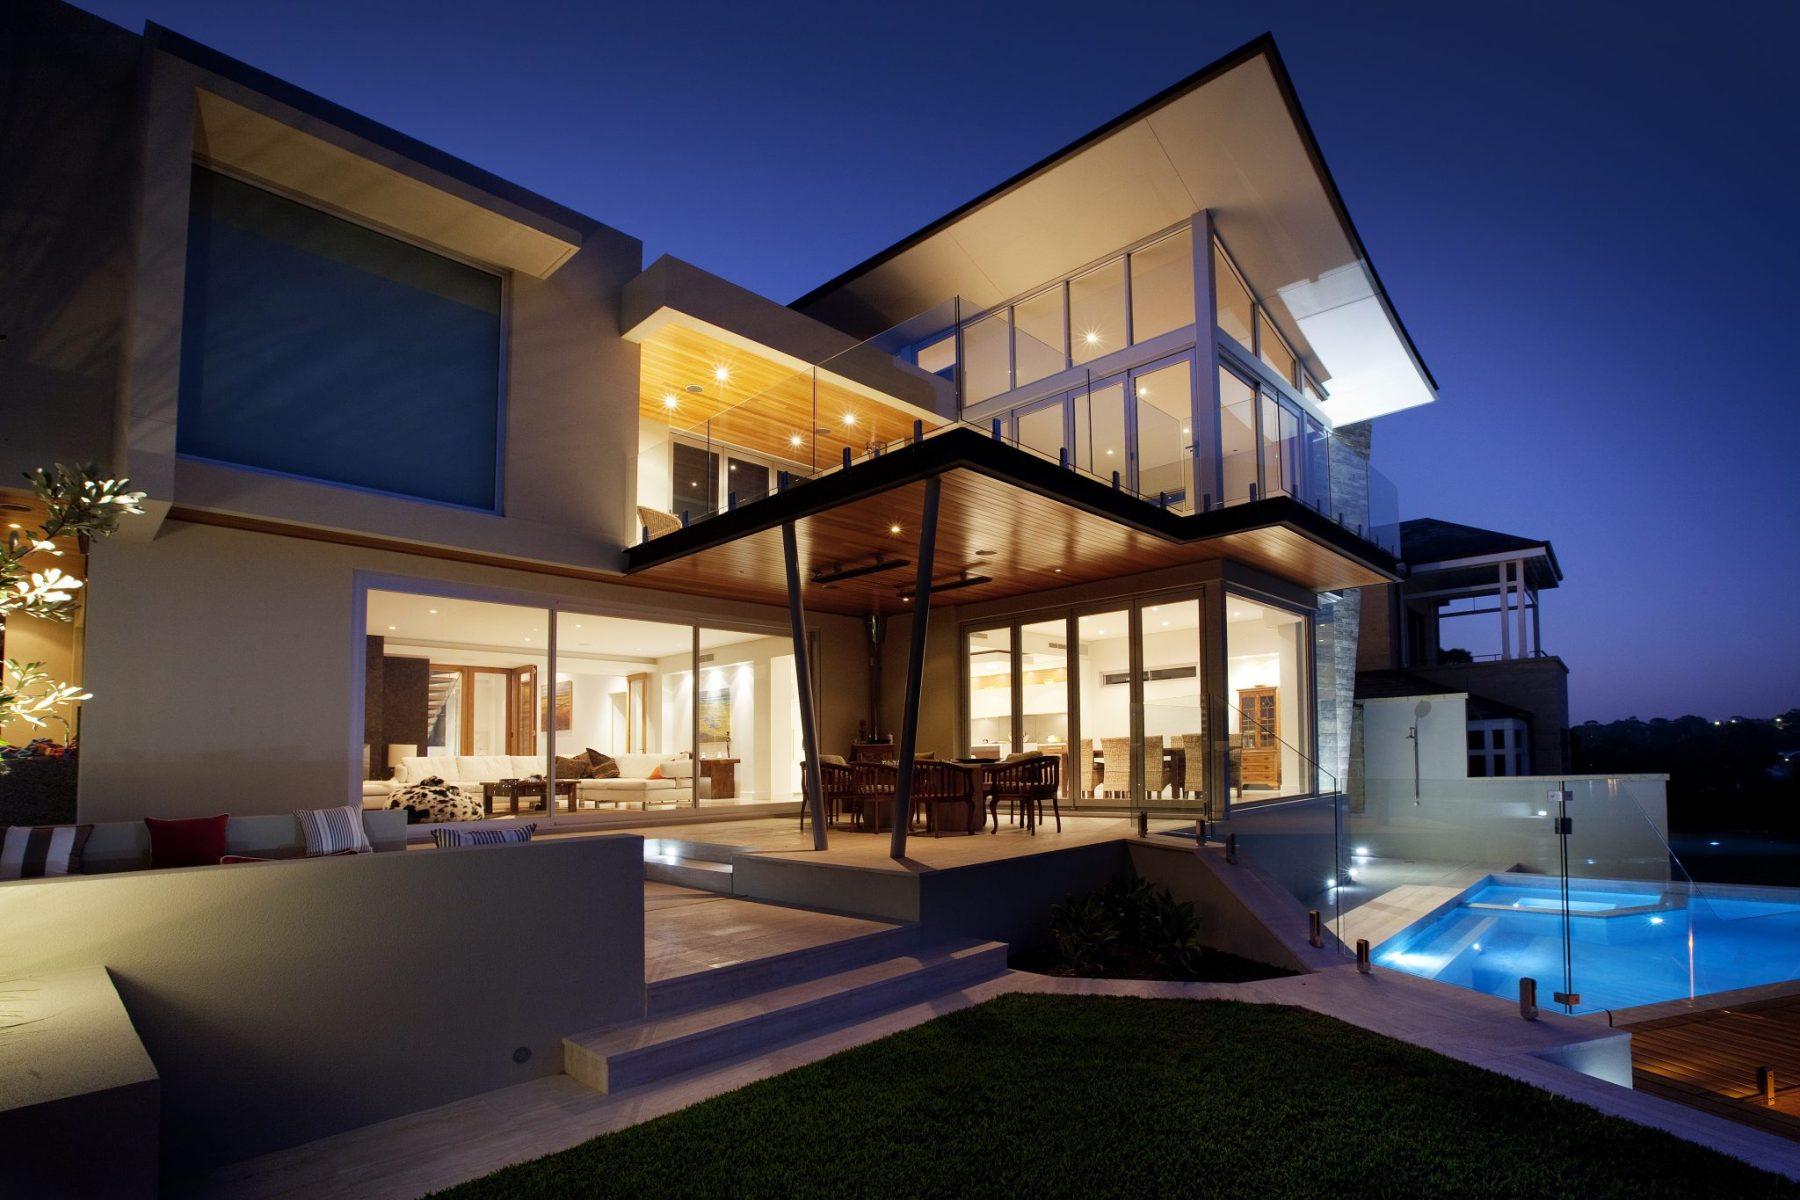 _Bicton Perth property landscape design by Ritz Exterior Design